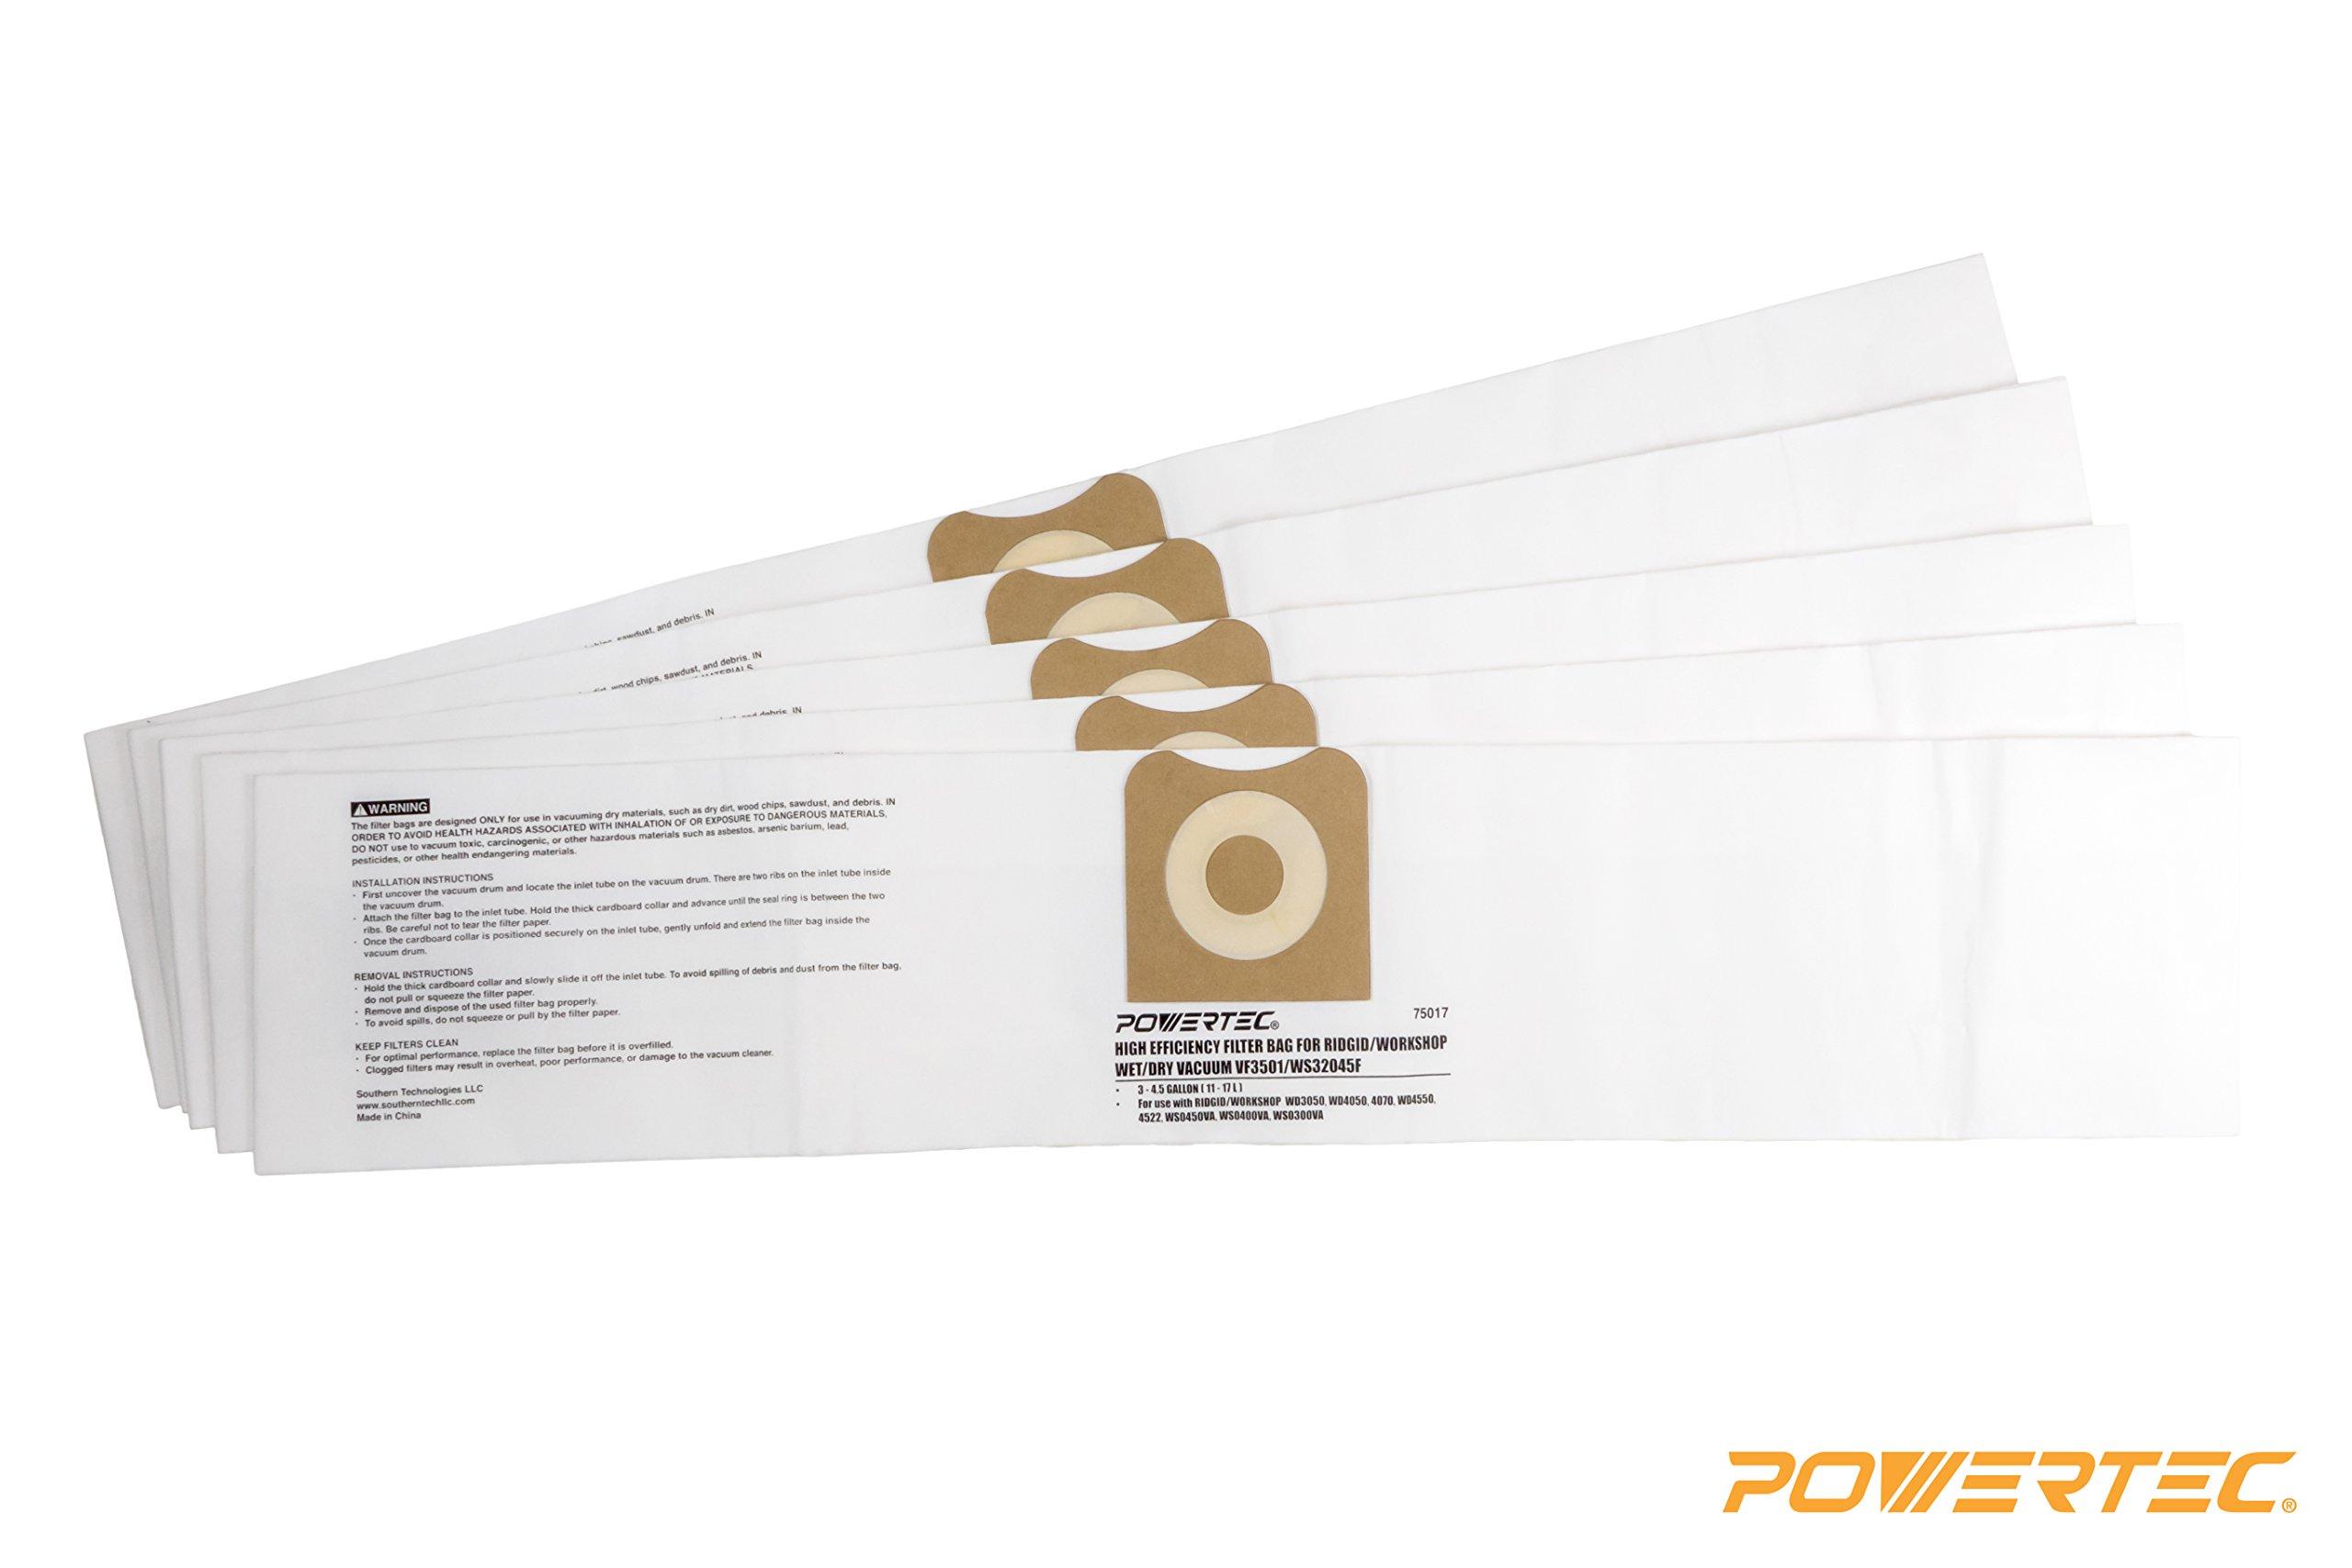 POWERTEC 75017 High Efficiency Filter Bags for Ridgid/Workshop Wet/Dry Vacuum VF3501 / WS32045F (Pack of 5)